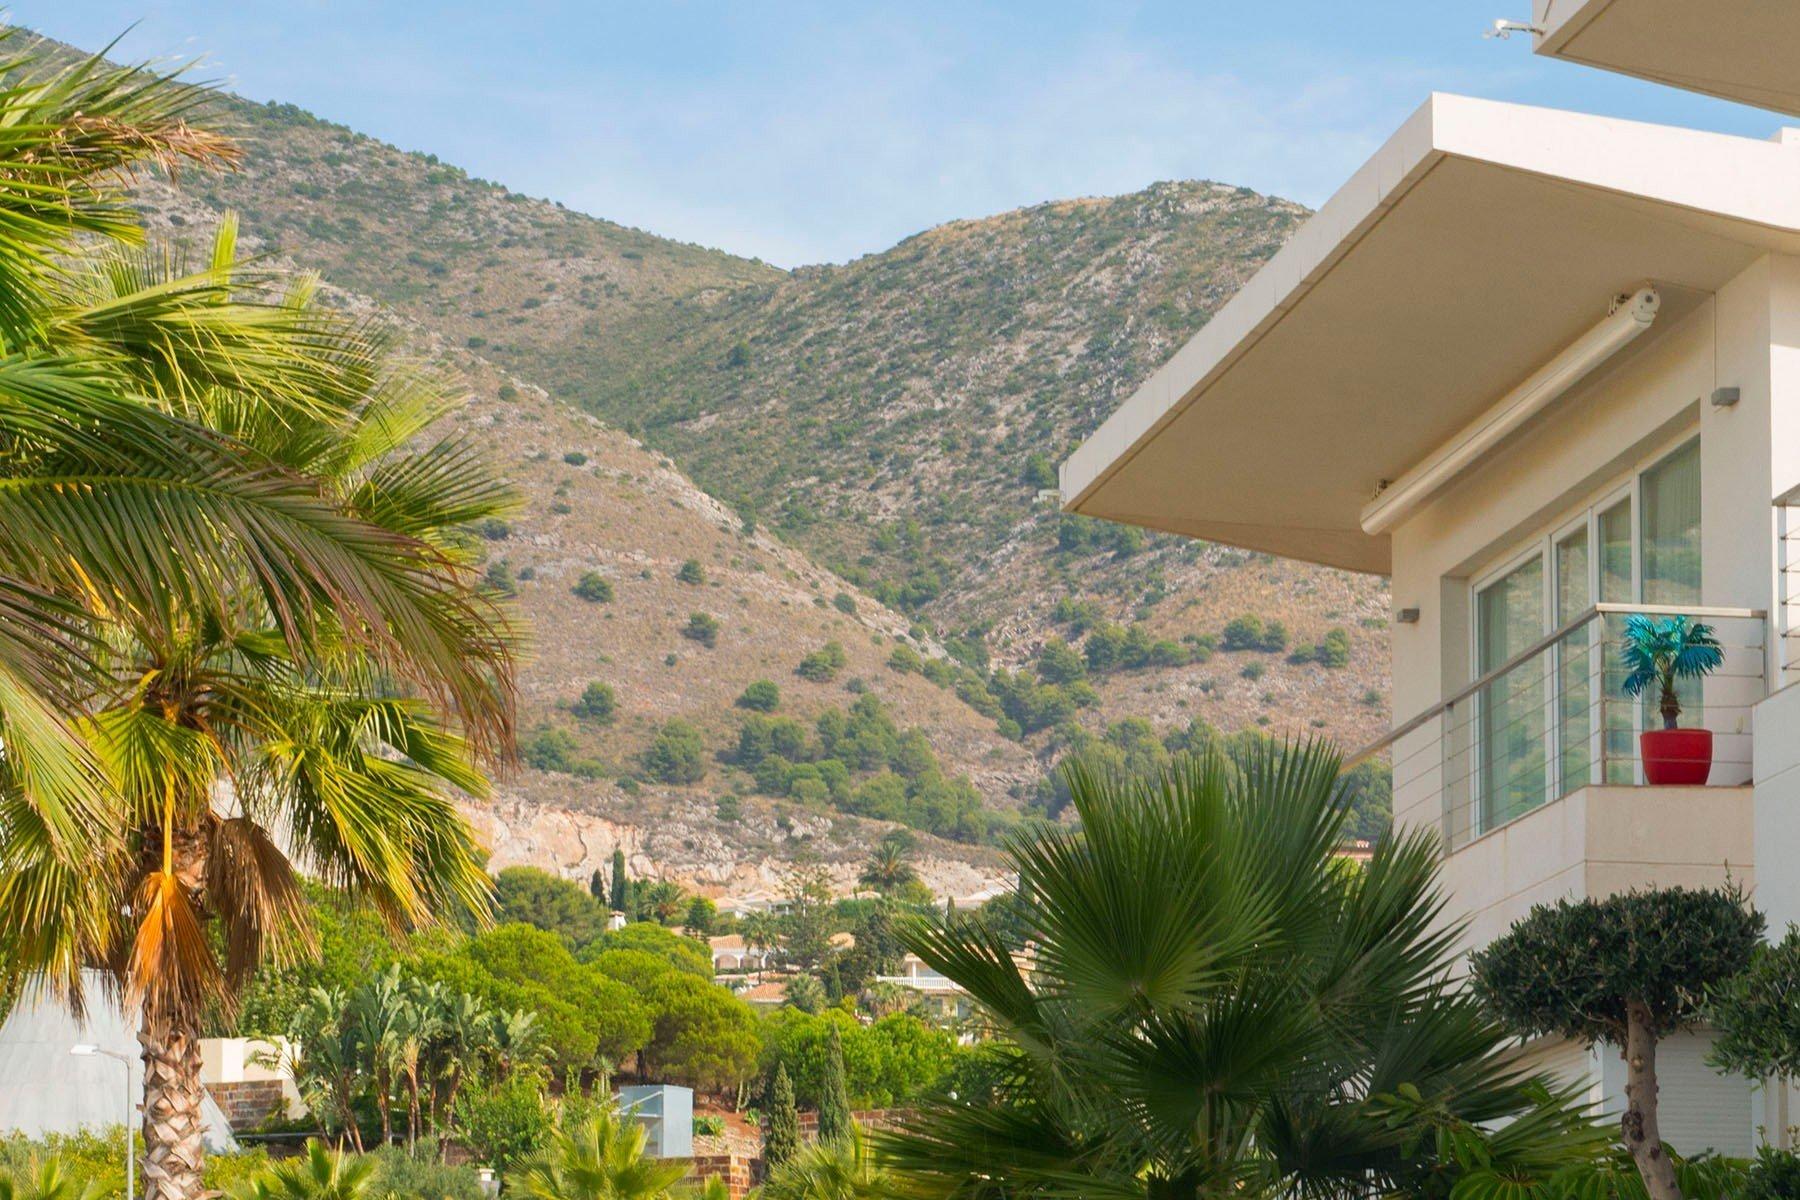 Villa for sale in Benalmadena, Reserva del Higueron